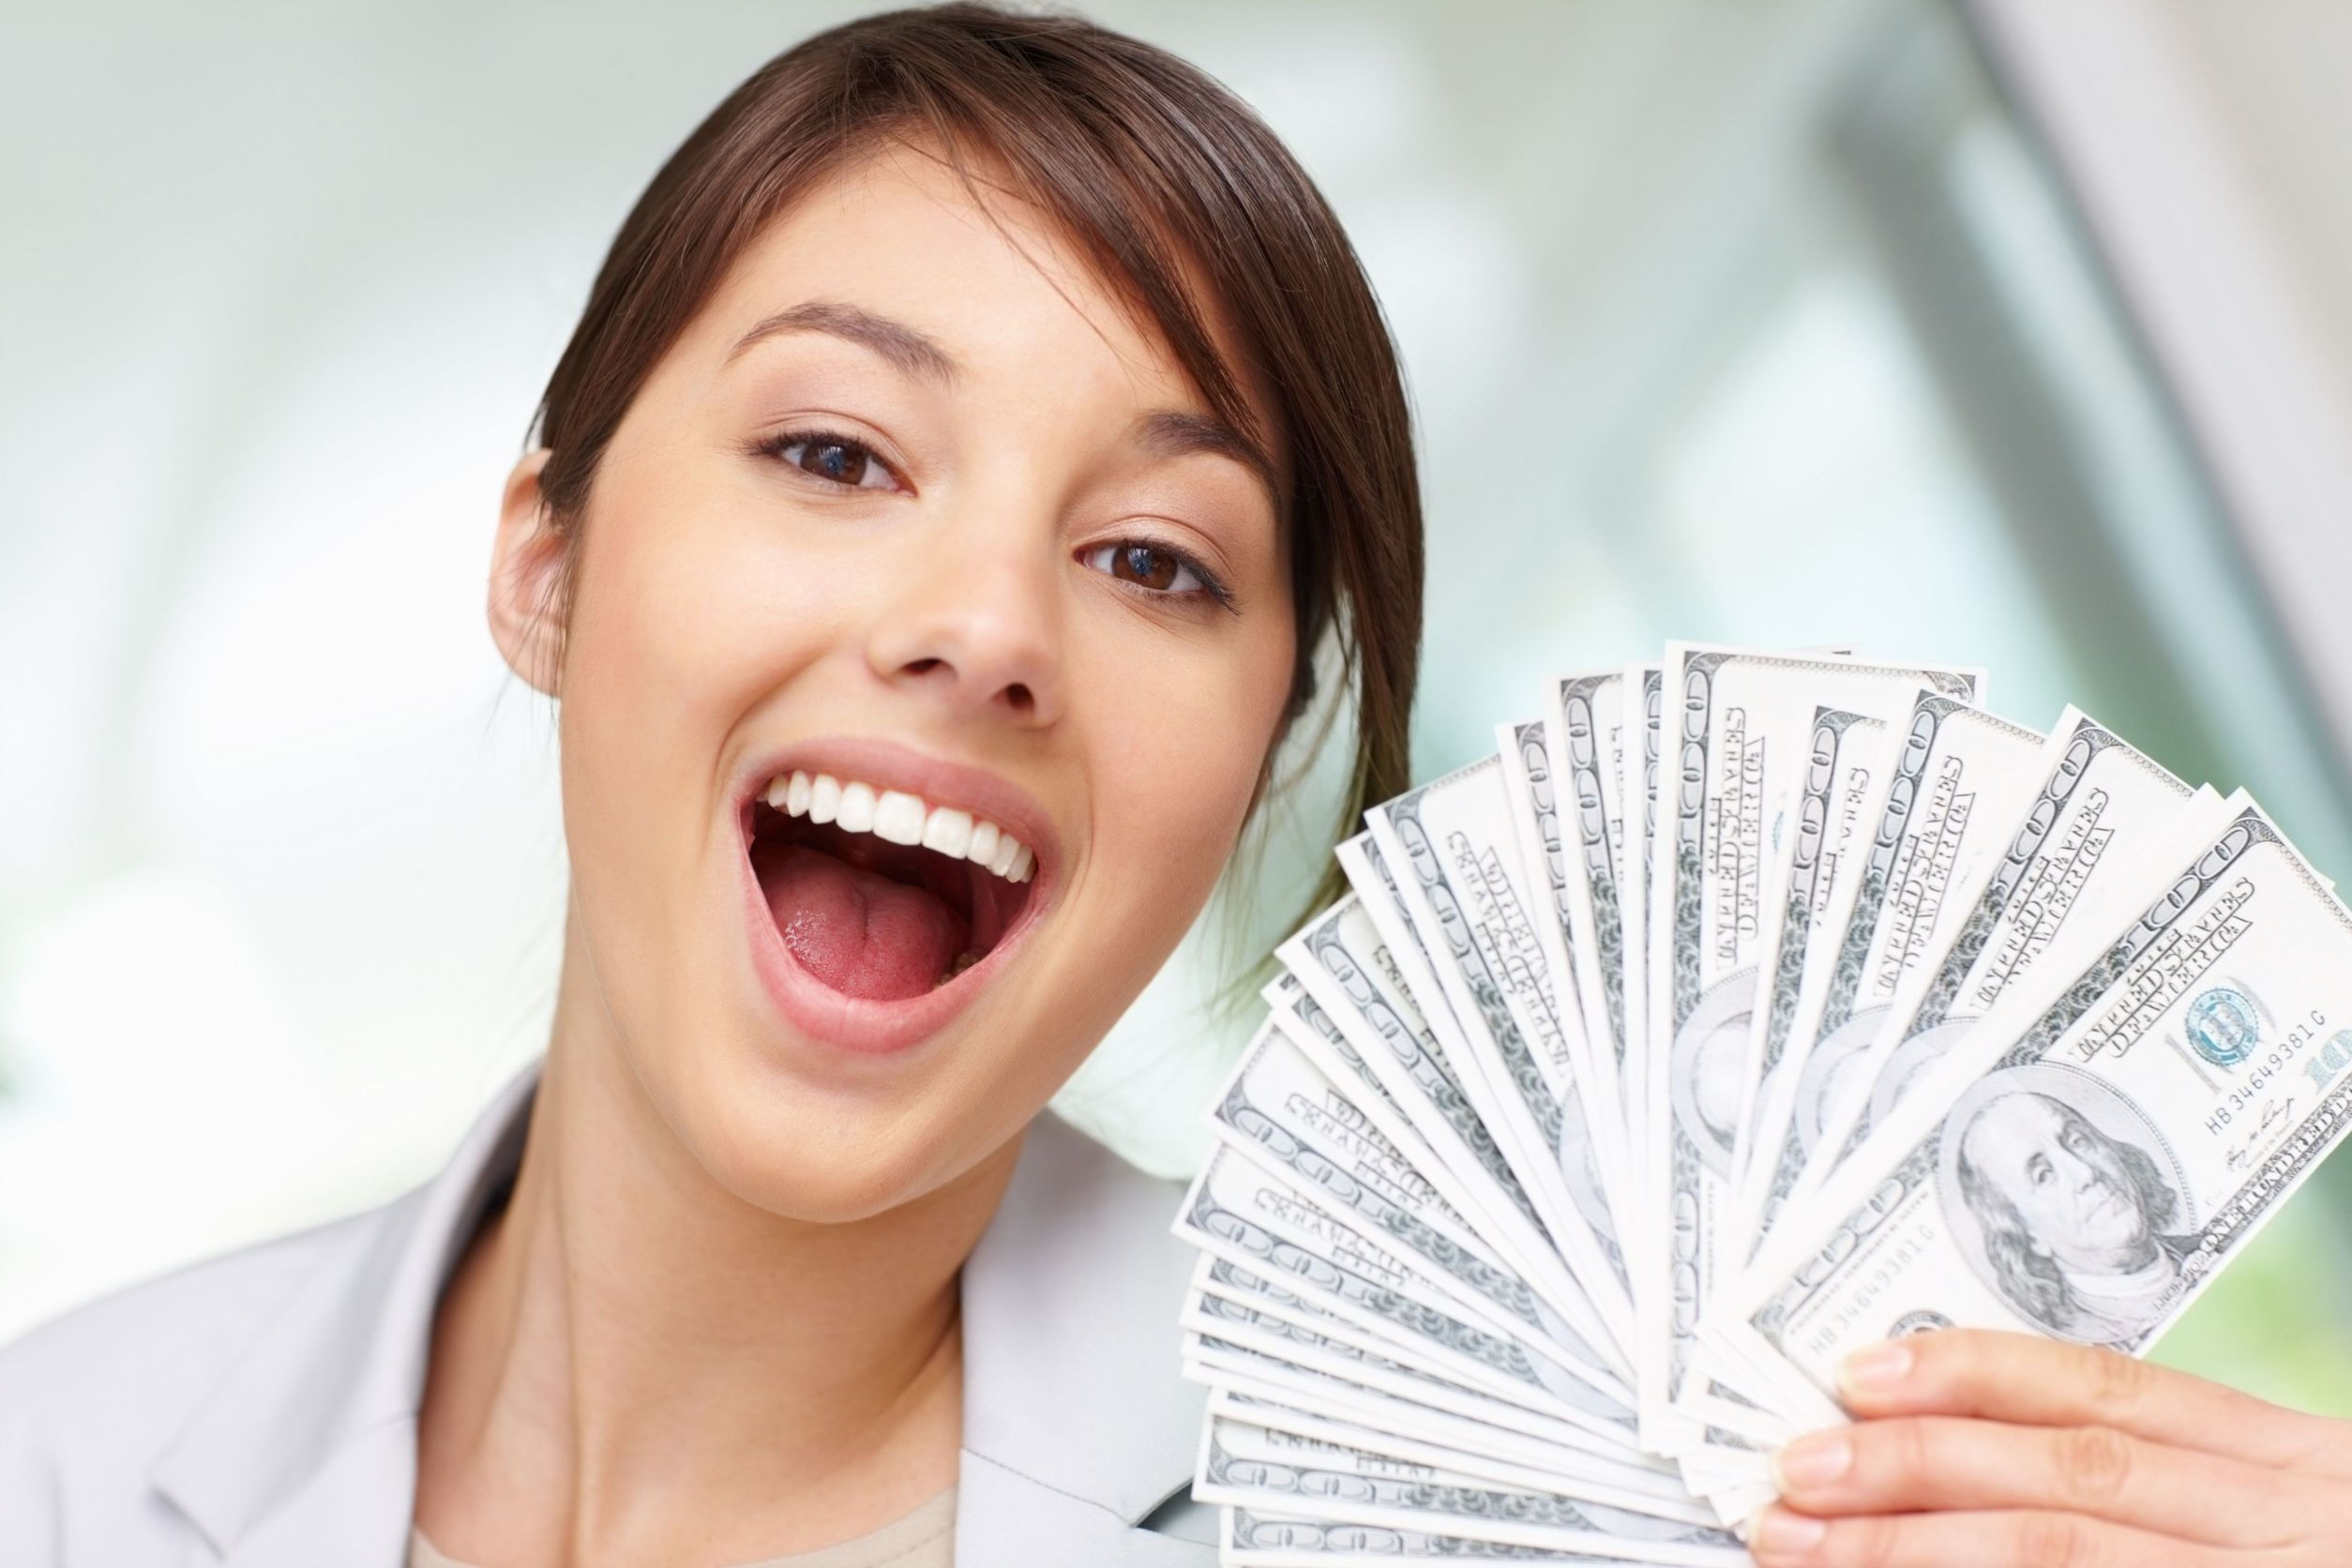 Apply For Cash Loan Upto 2 500 Http Goo Gl Fs7zcq Make Money On Internet Instant Cash Loans Extra Cash Online